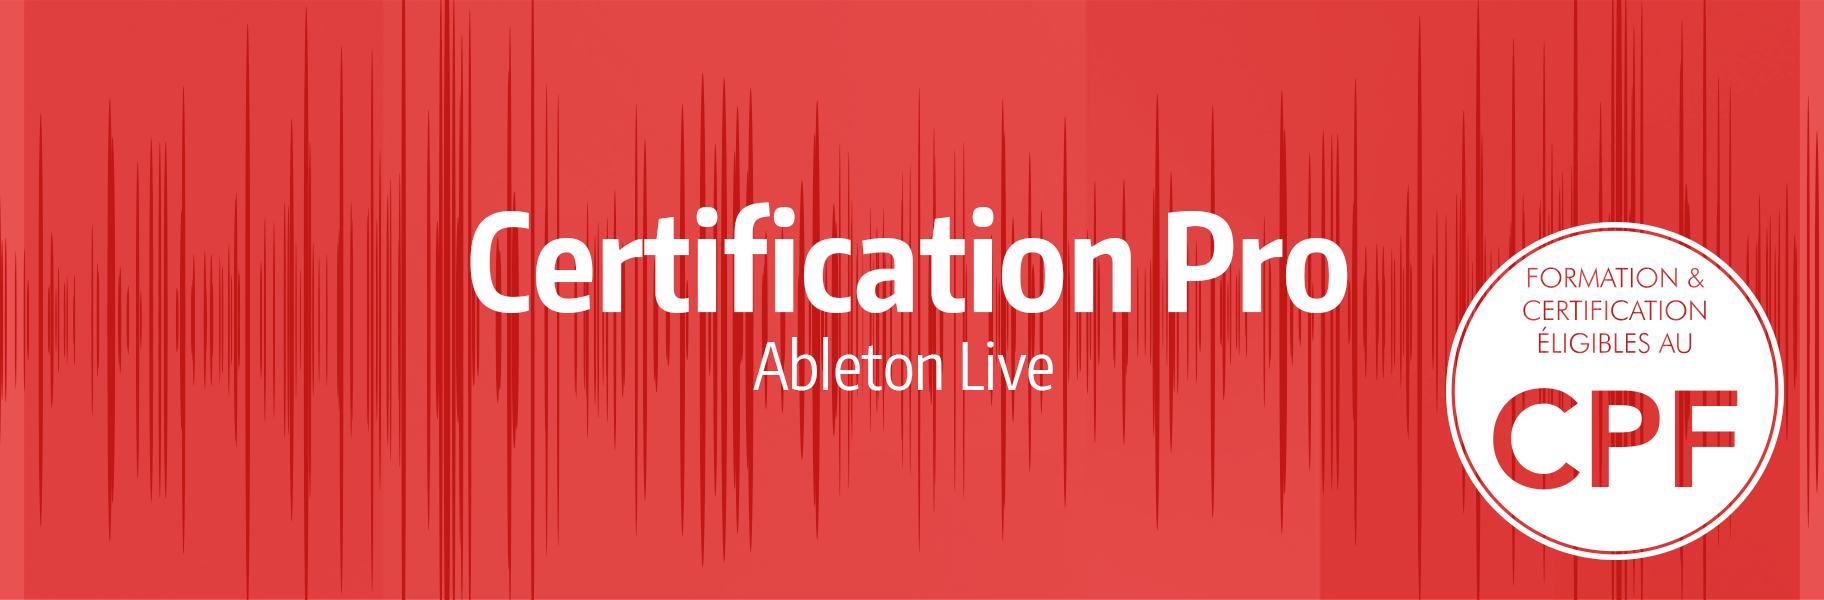 News - Certification Pro Ableton Live